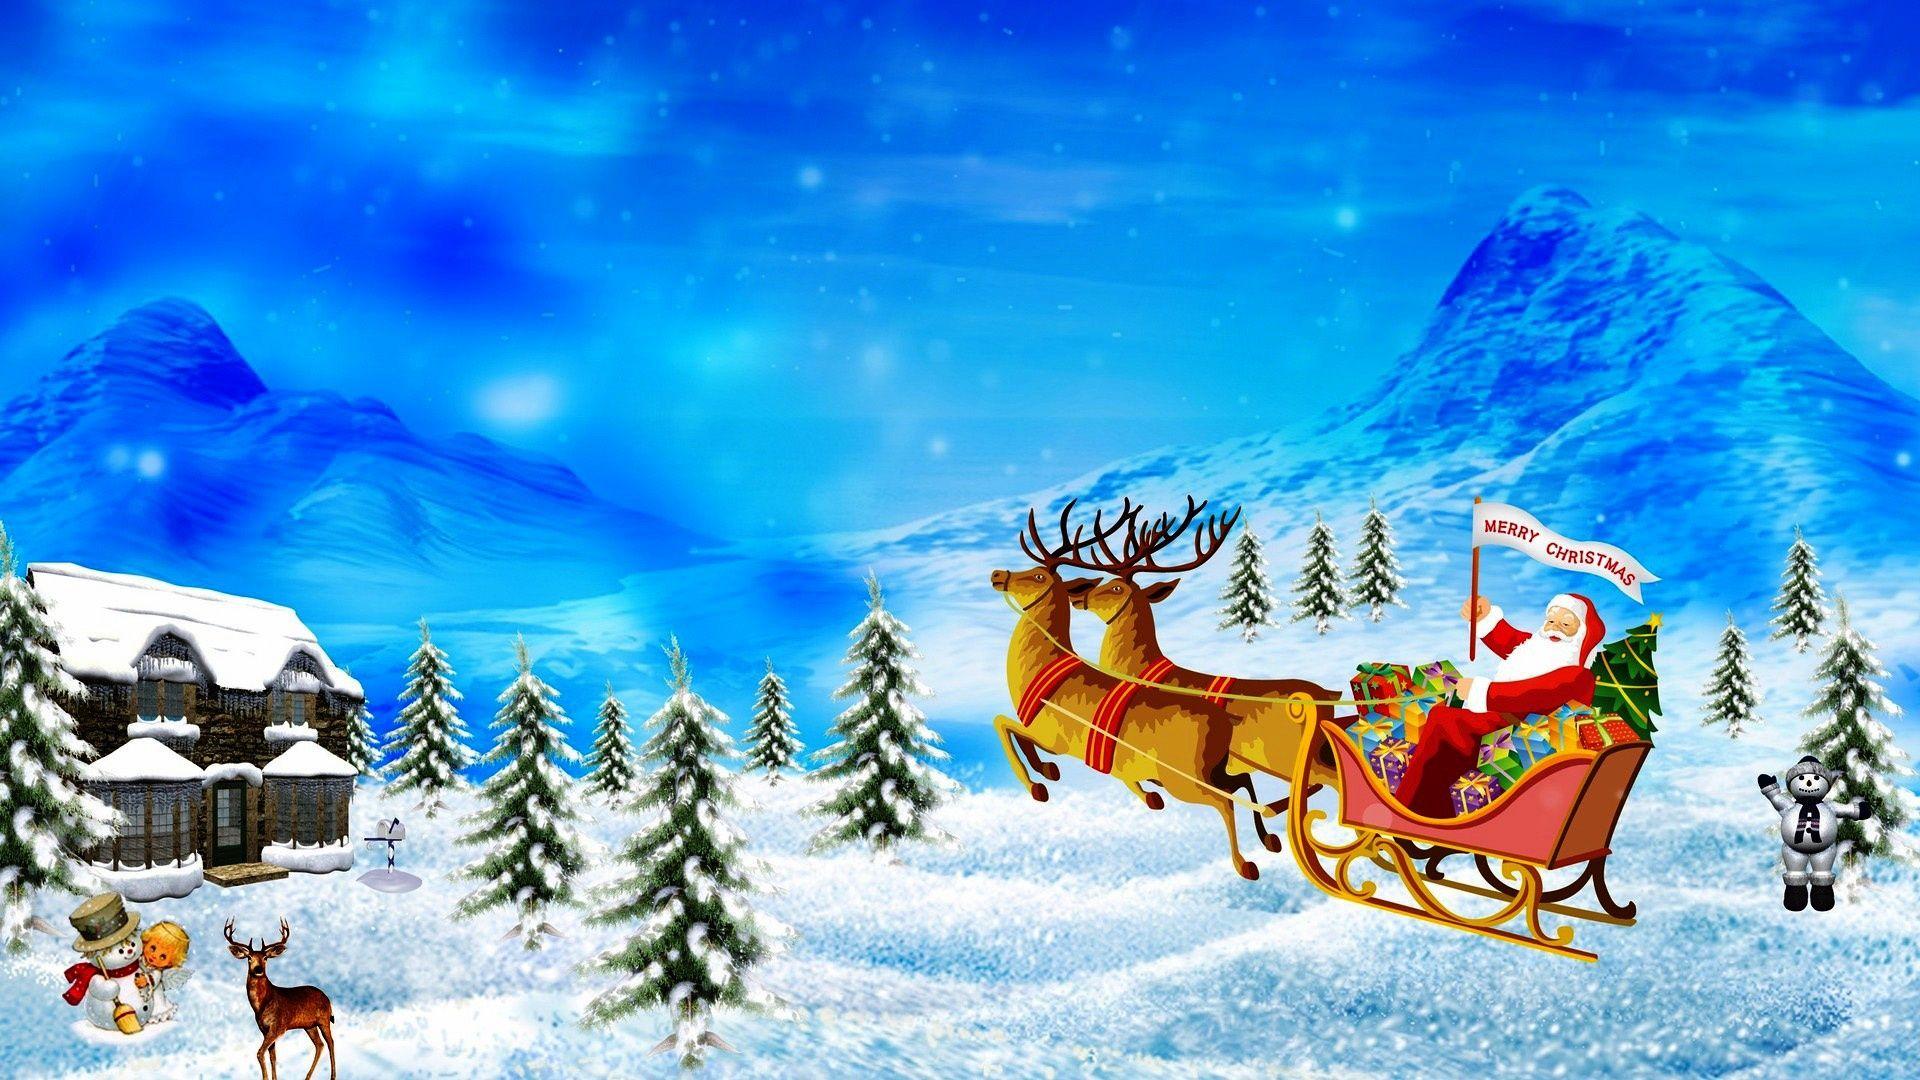 Merry Christmas Wallpaper Vector HD